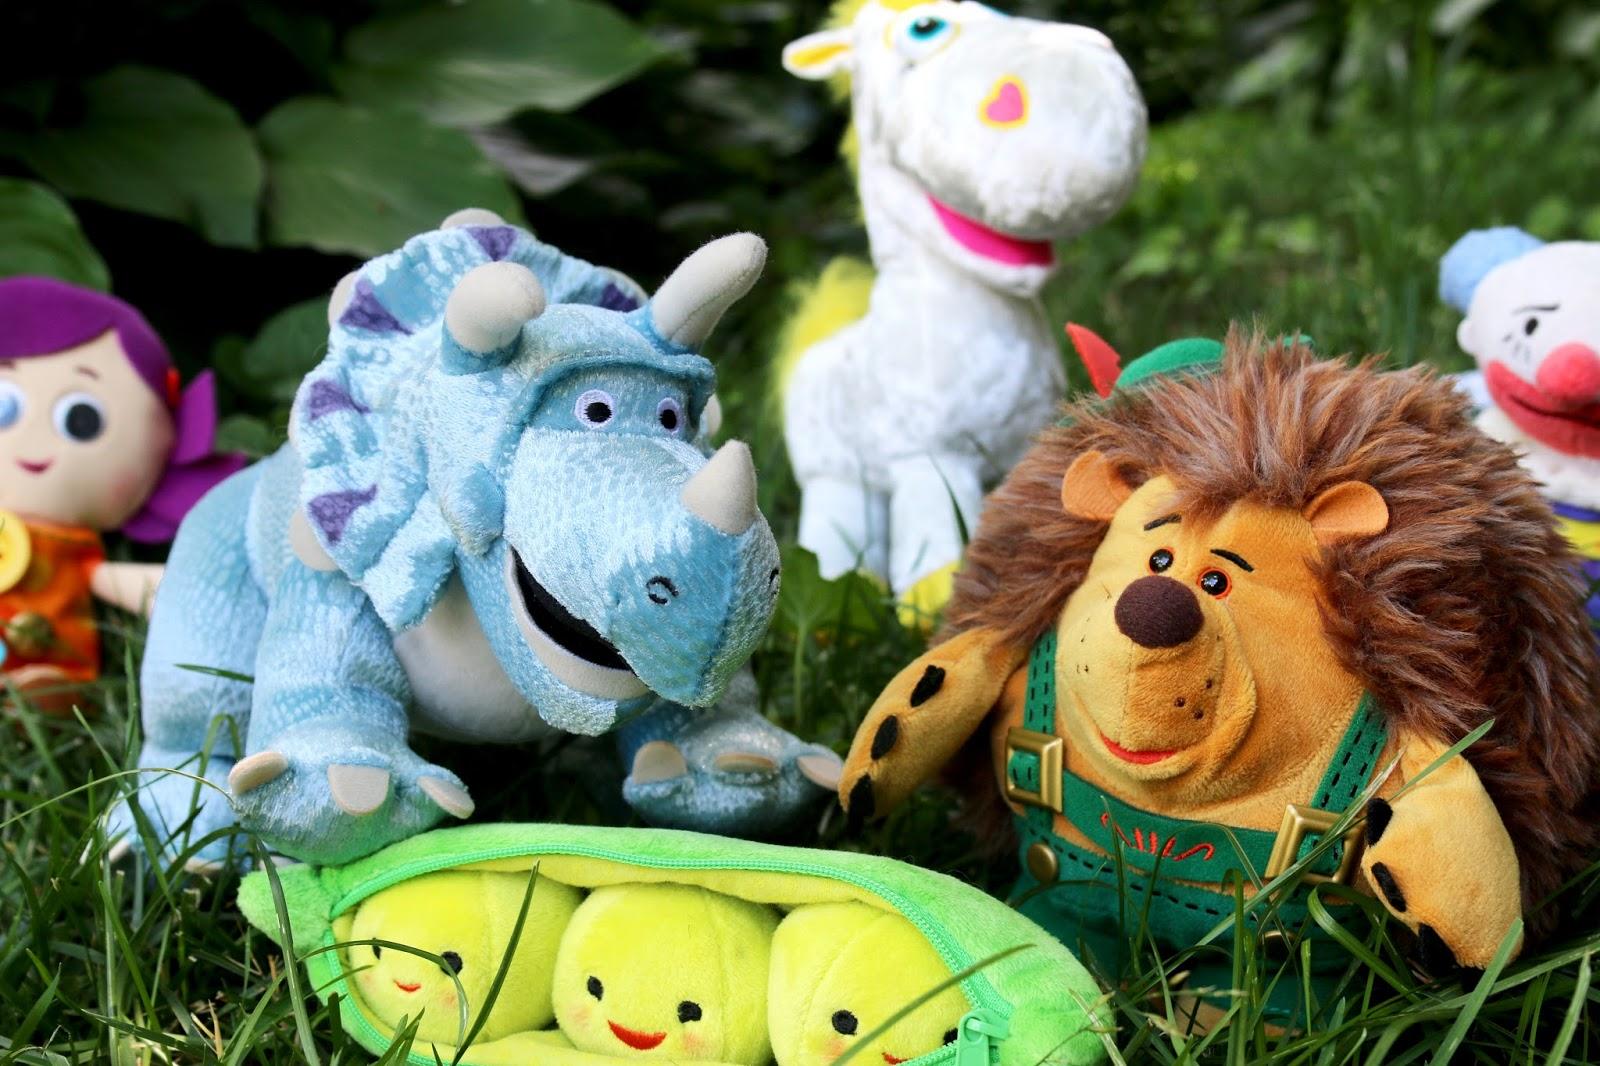 toy story replicas bonnie's toys